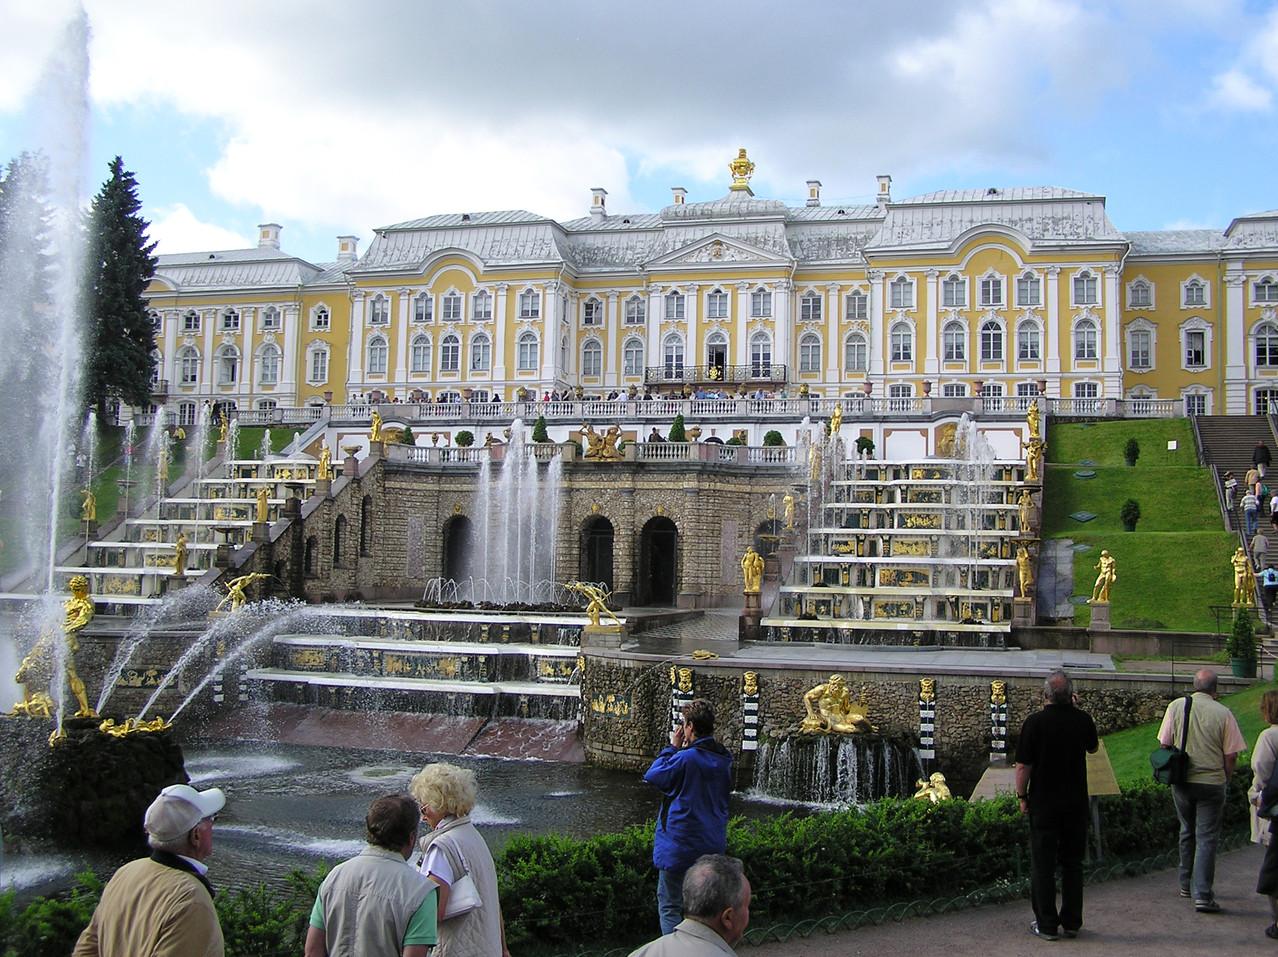 In Peterhof: Sommerresidenz, Baubeginn 1714